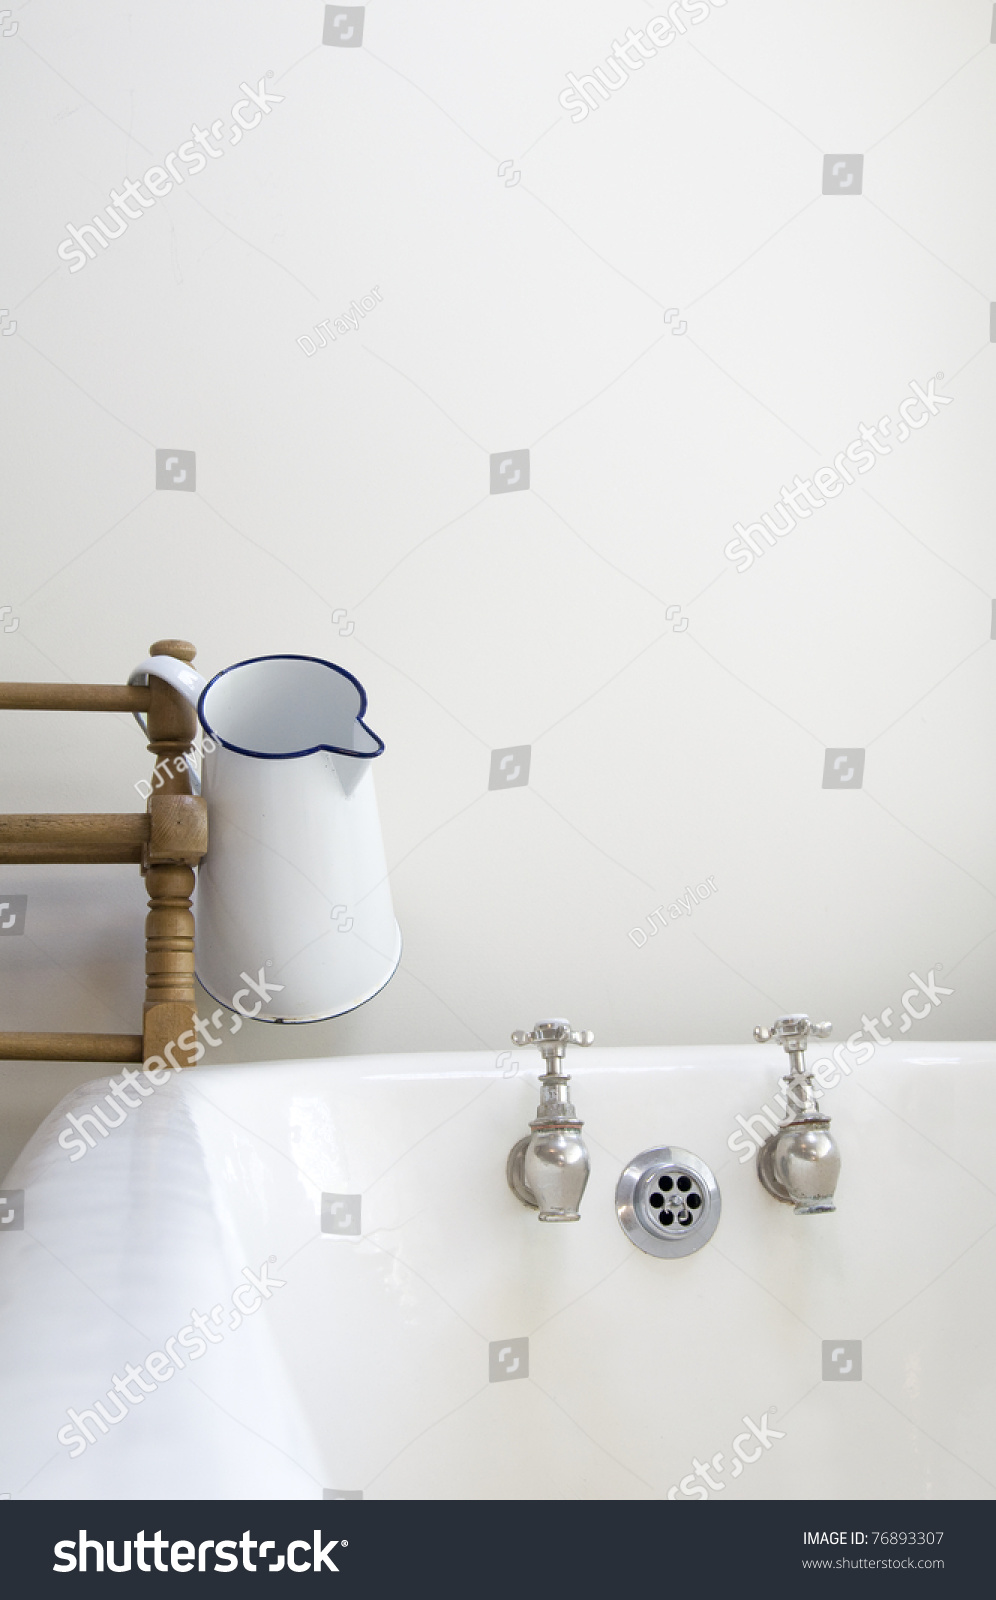 Old Fashioned Bathroom Bath Water Jug Stock Photo (Edit Now ...